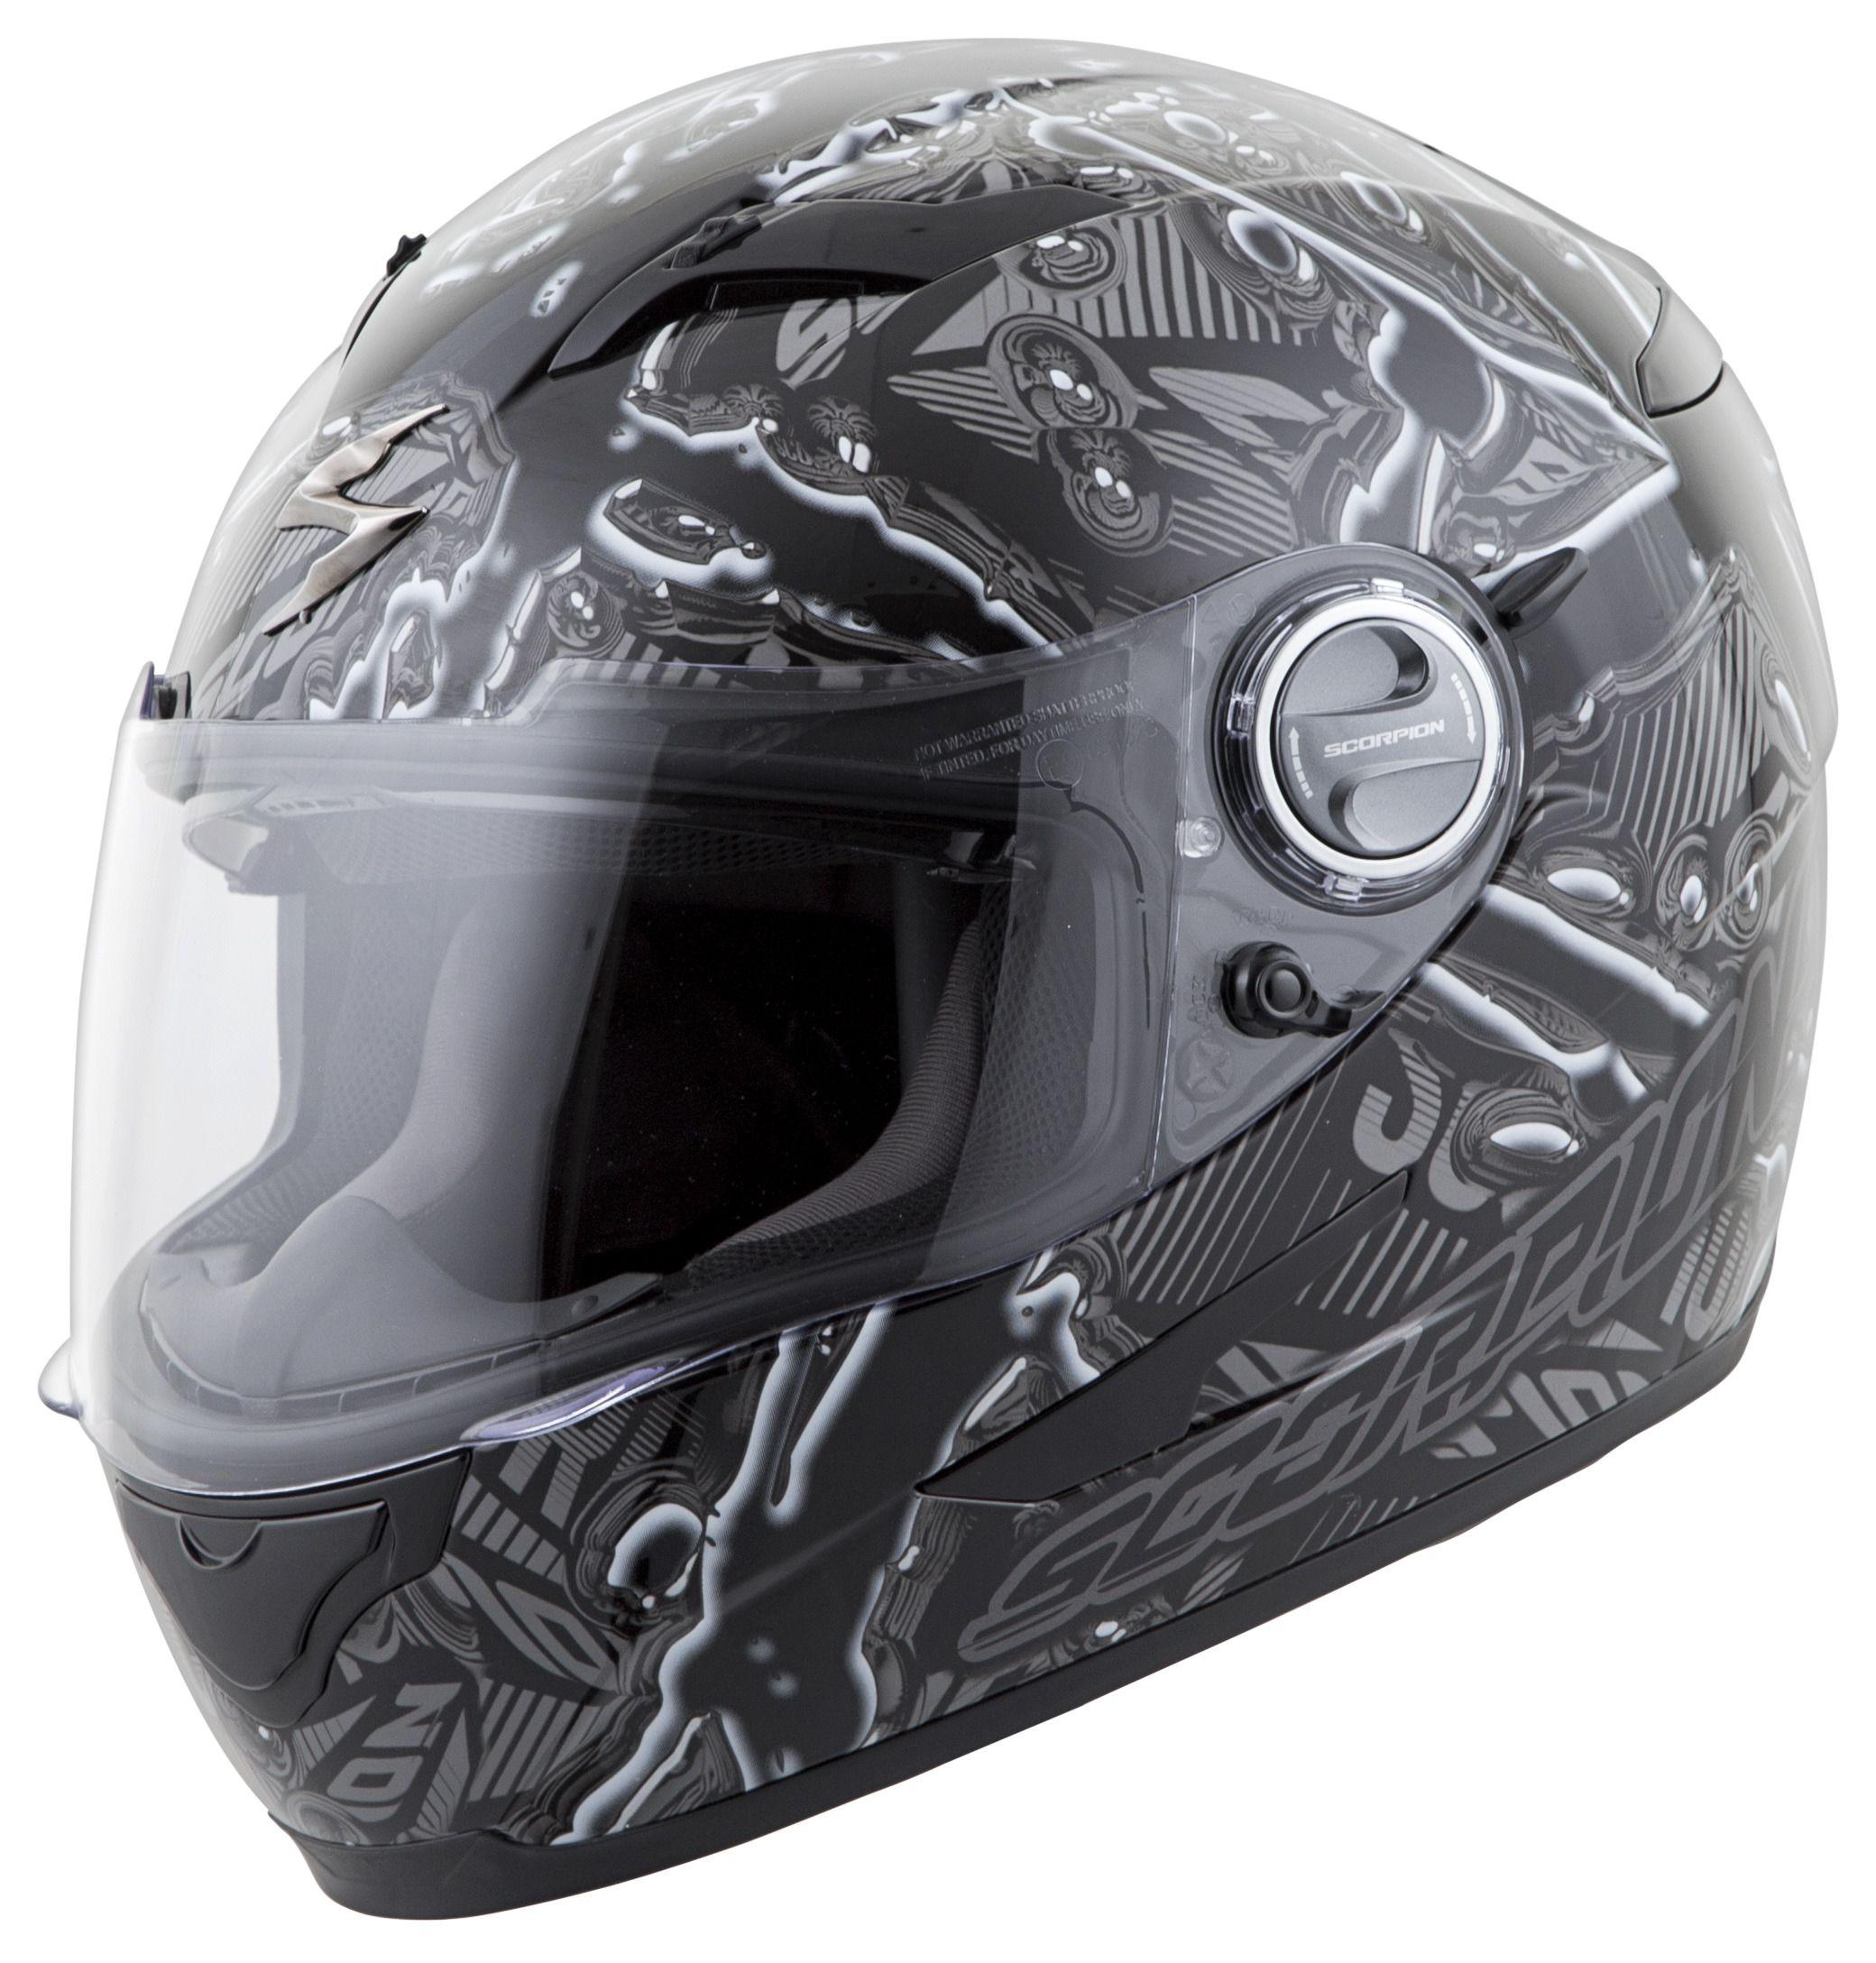 scorpion exo 500 crude helmet size xl only revzilla. Black Bedroom Furniture Sets. Home Design Ideas